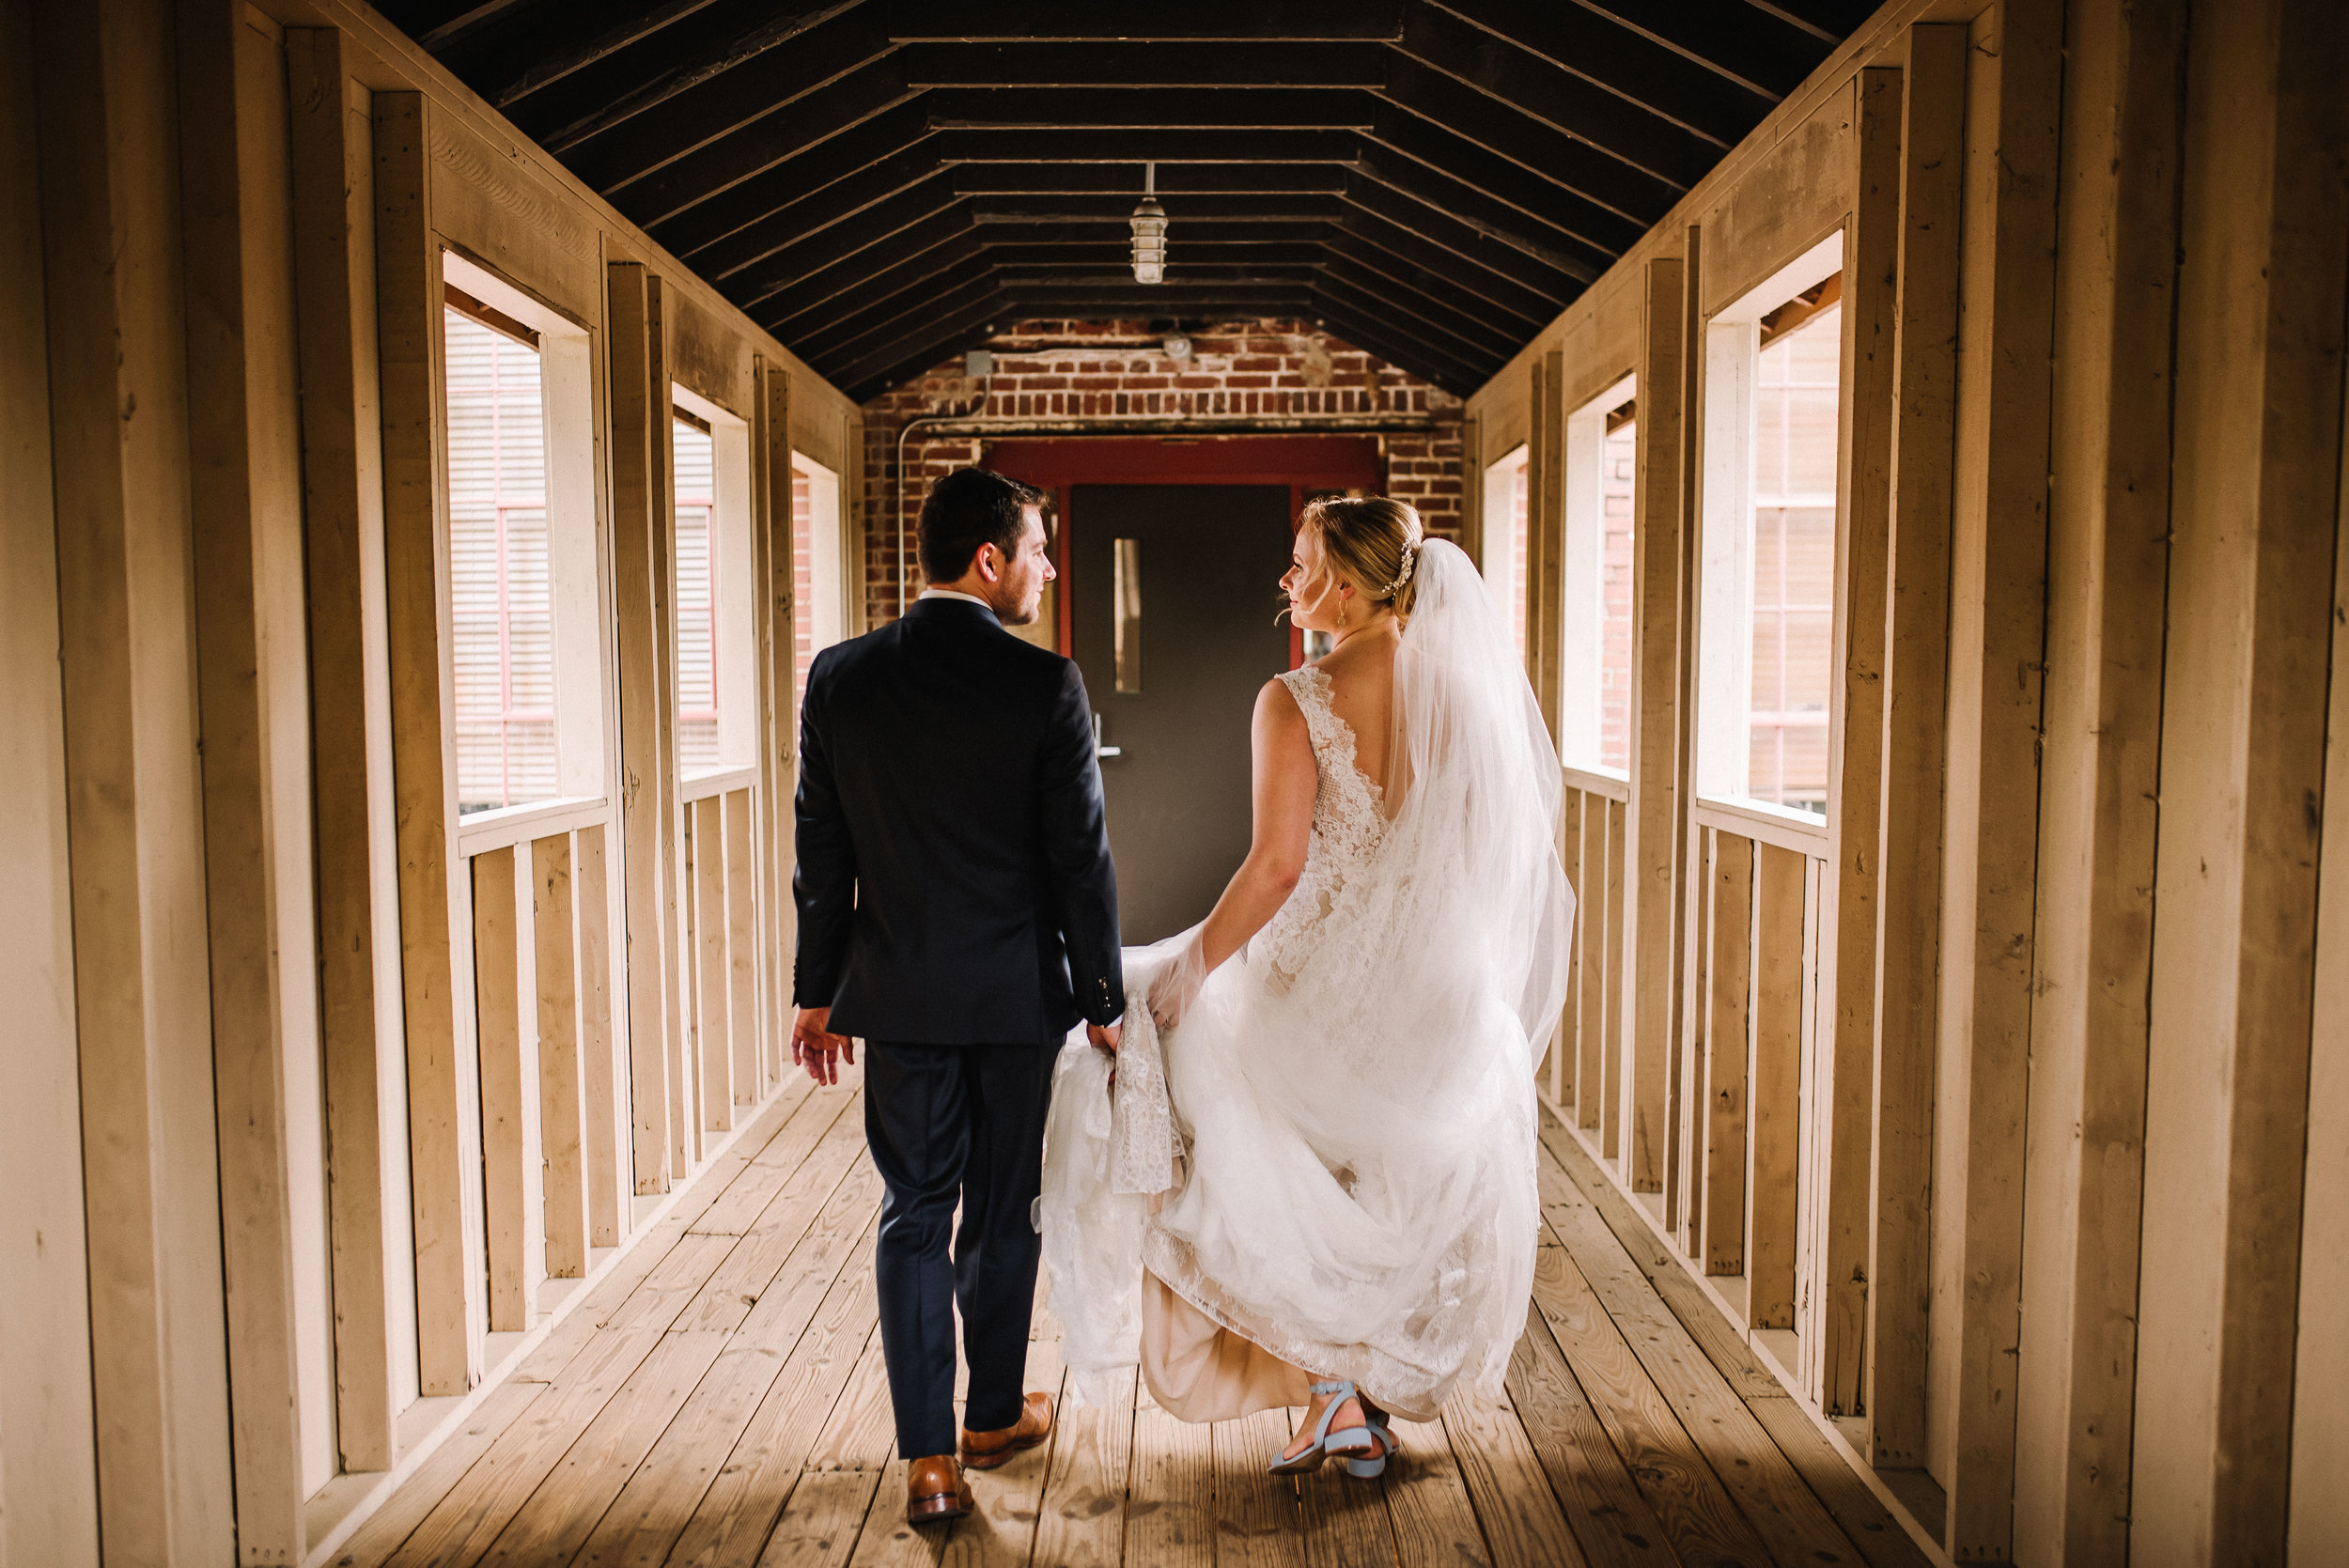 Morgan Wedding_Mill at Yellow River_Ashley Benham Photography-408.jpg